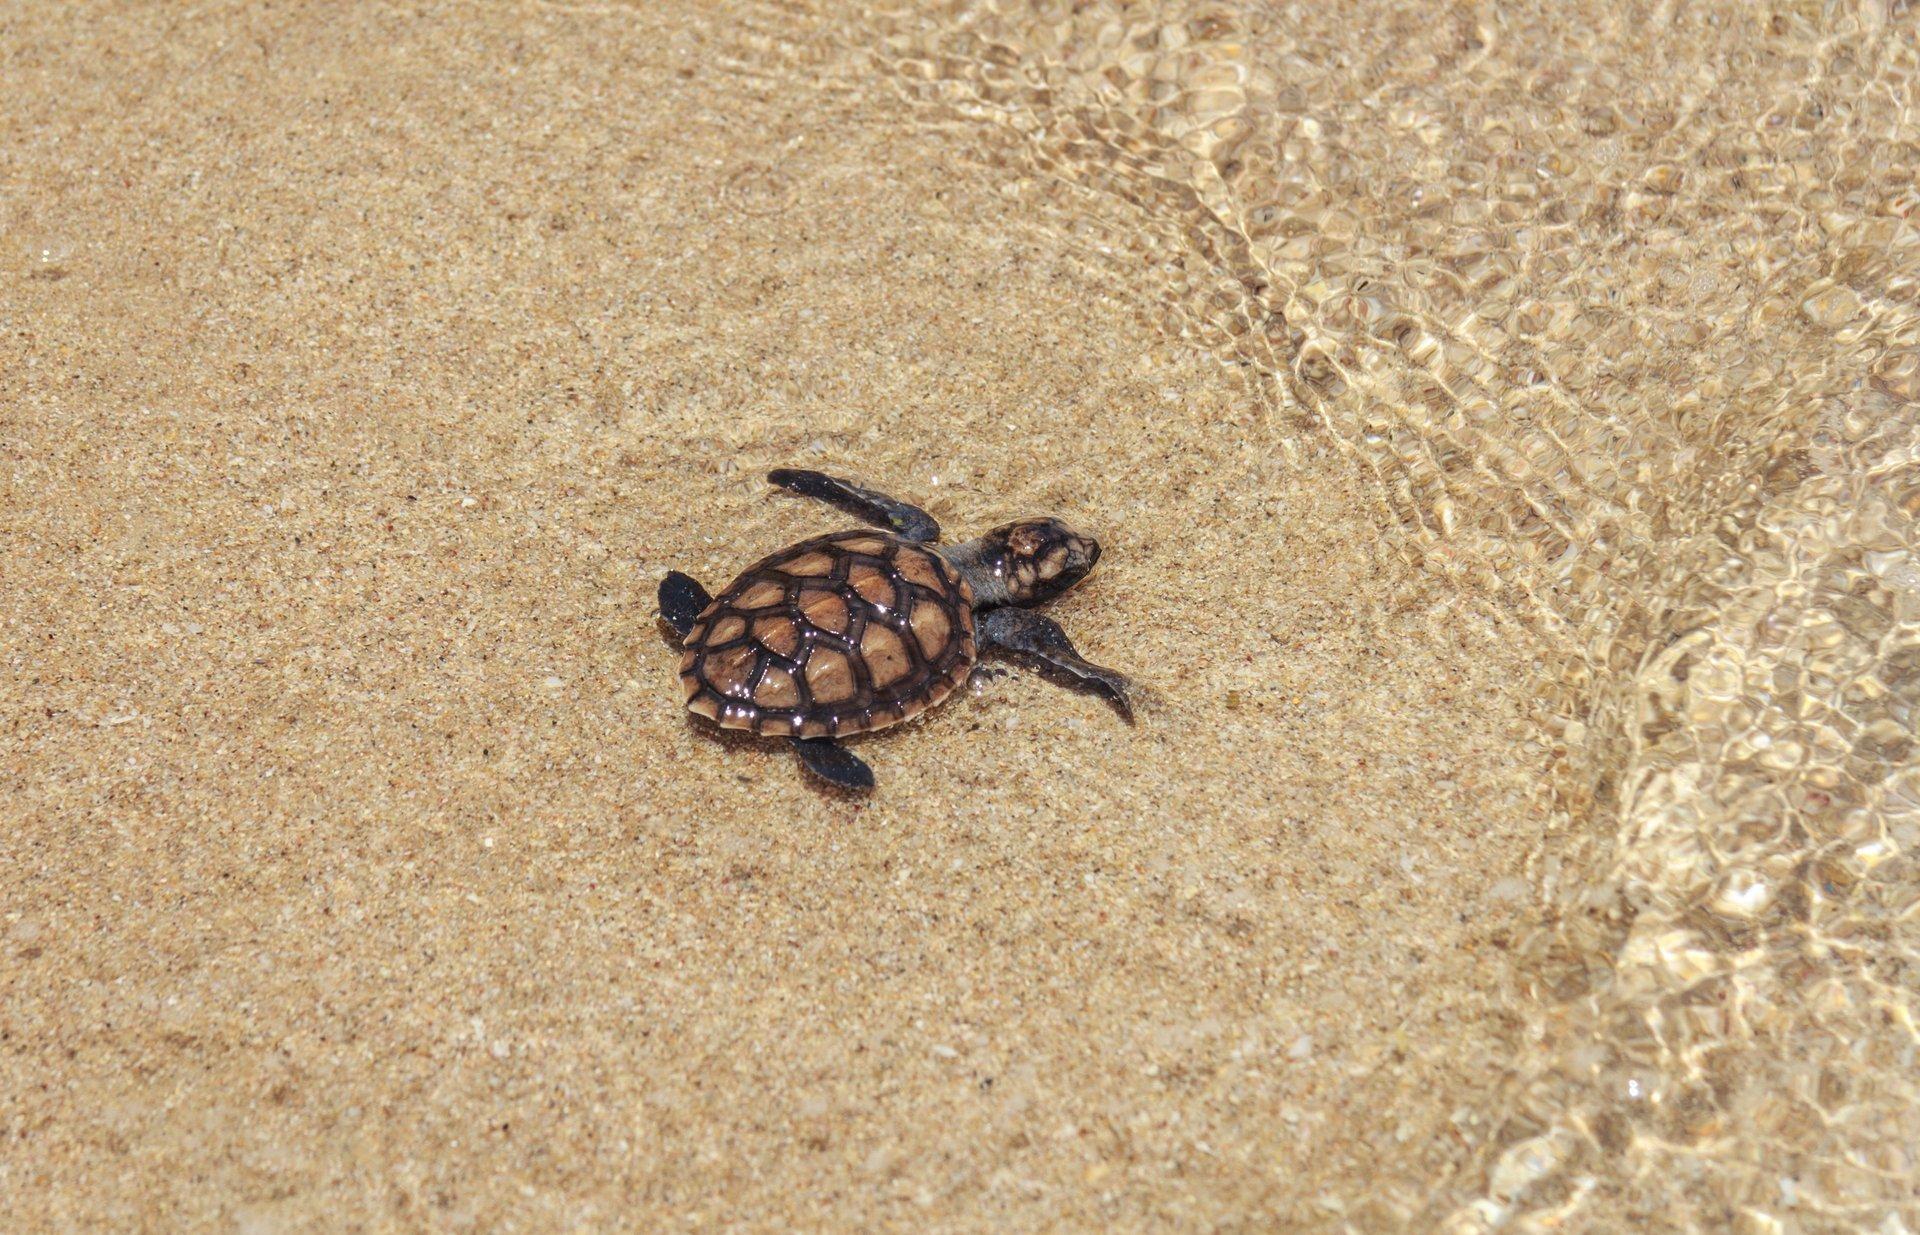 Baby Turtles Hatching Season in Bora Bora 2019 - Best Time